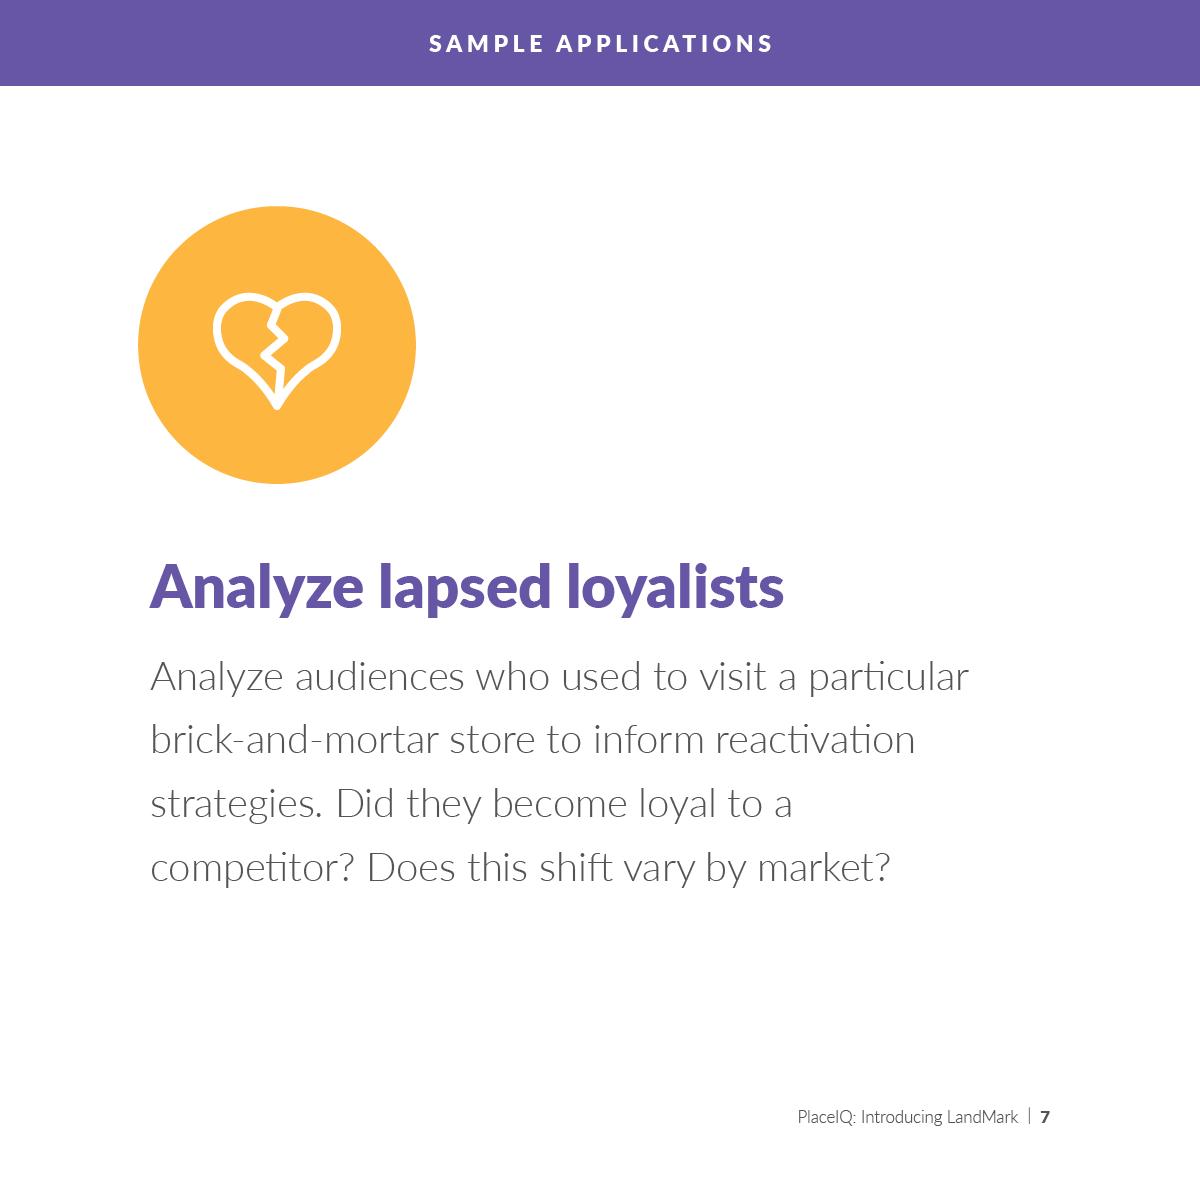 Analyze lapsed loyalists